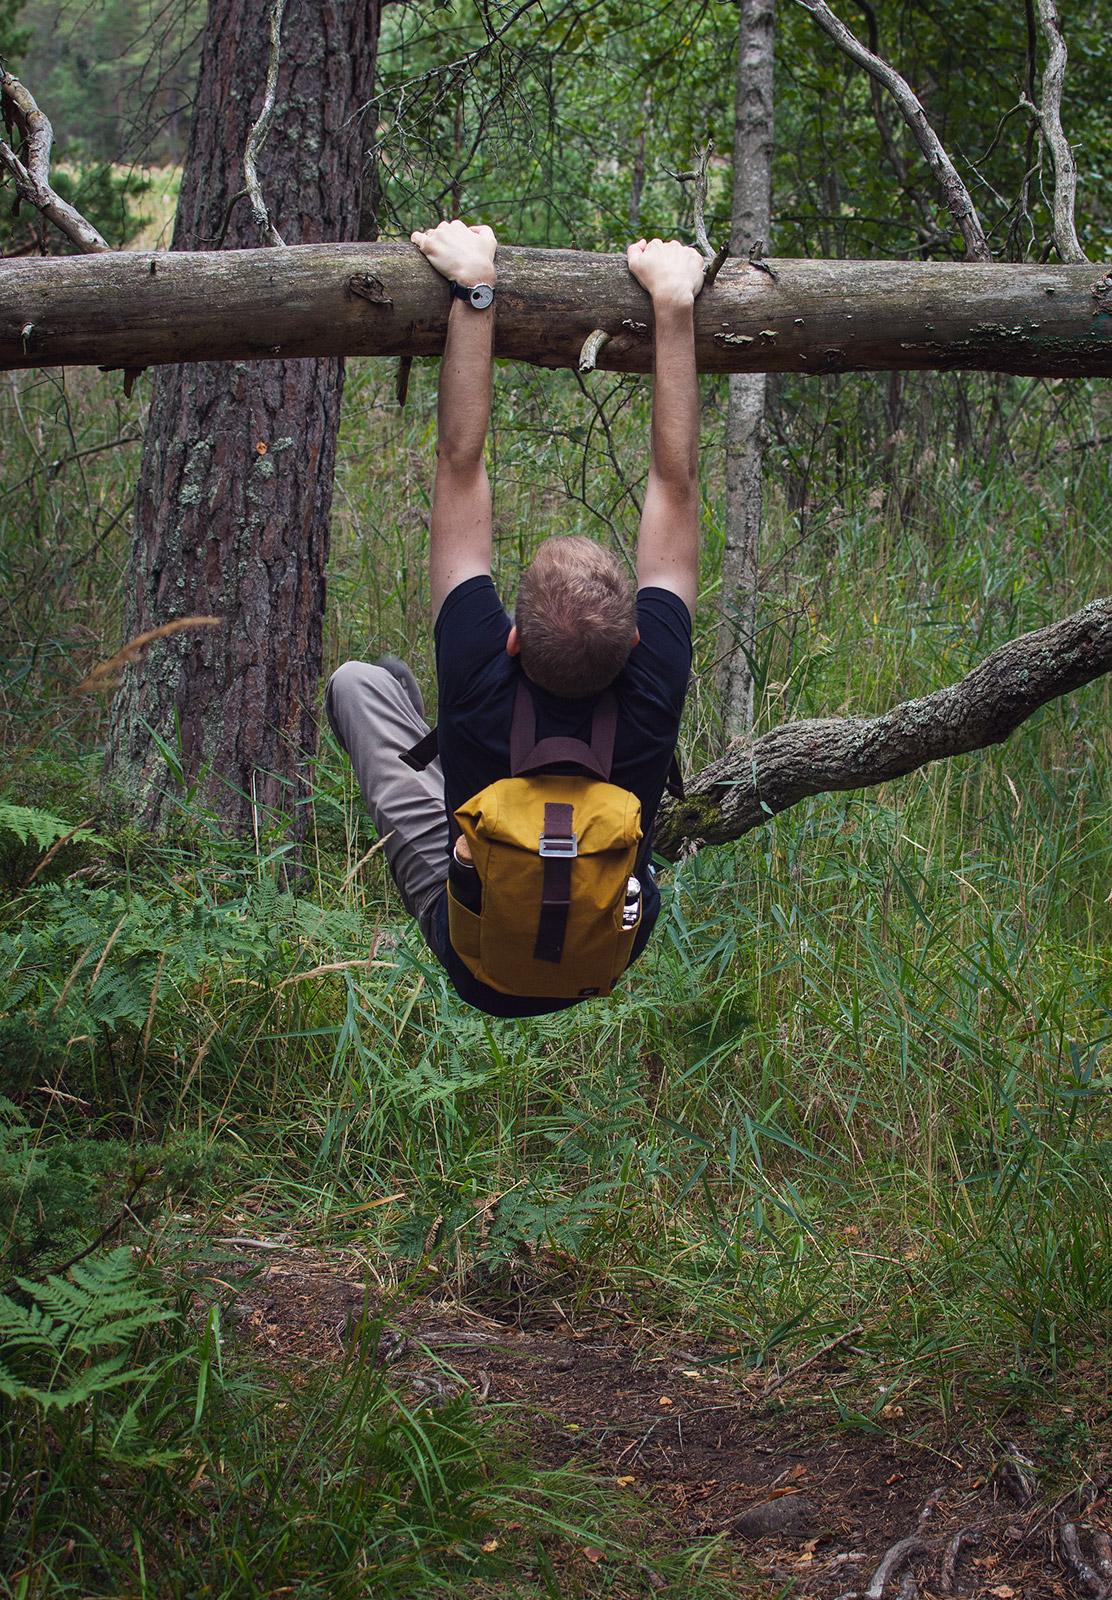 Man hanging from tree bracnh